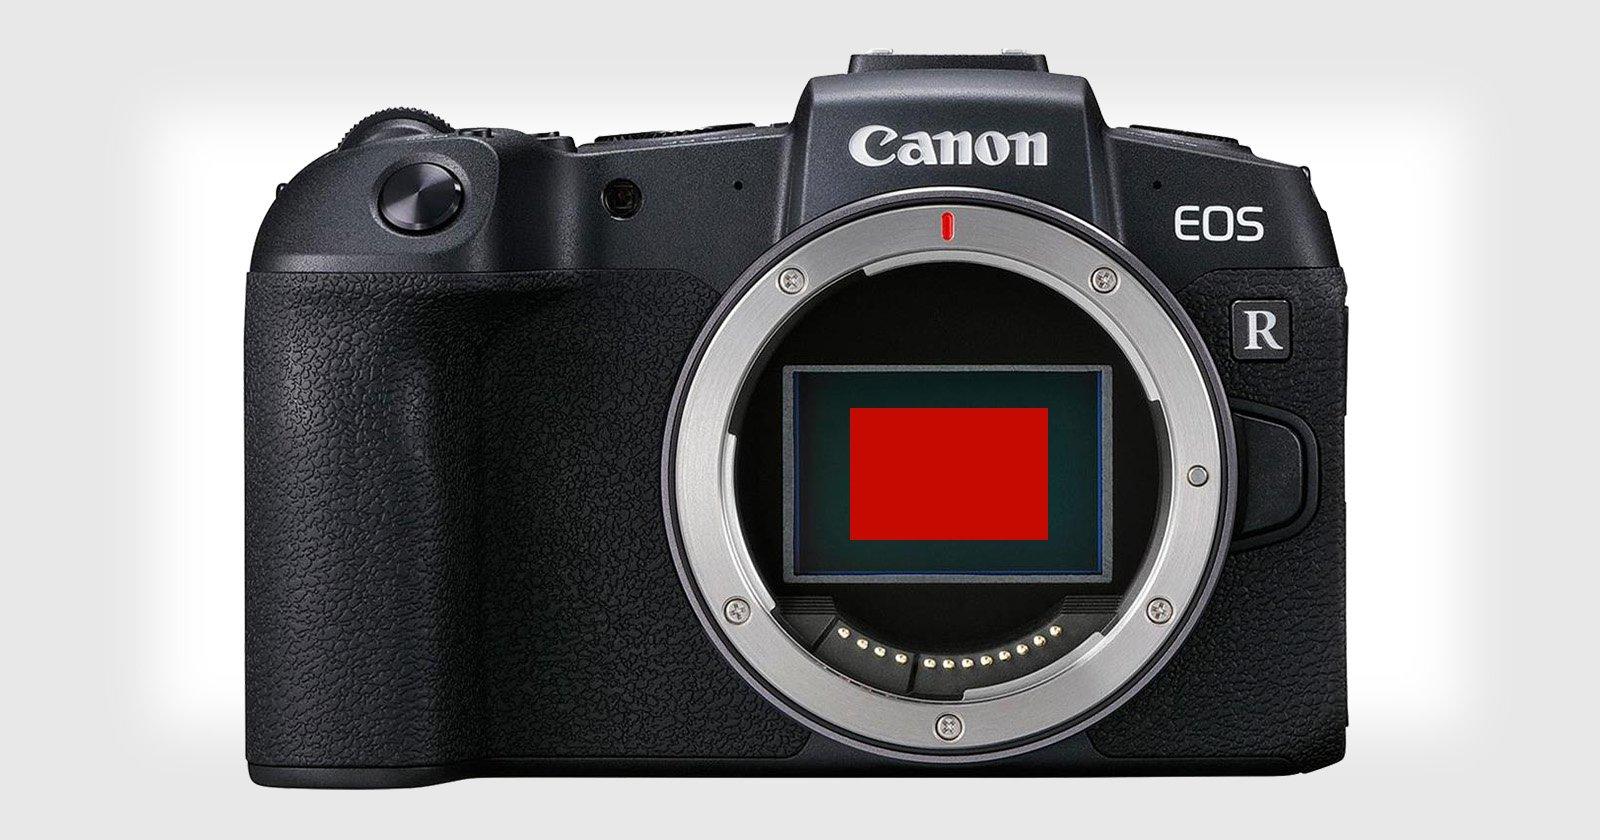 Canon is Planning to Release a Crop-Sensor EOS R in 2021: Report - PetaPixel